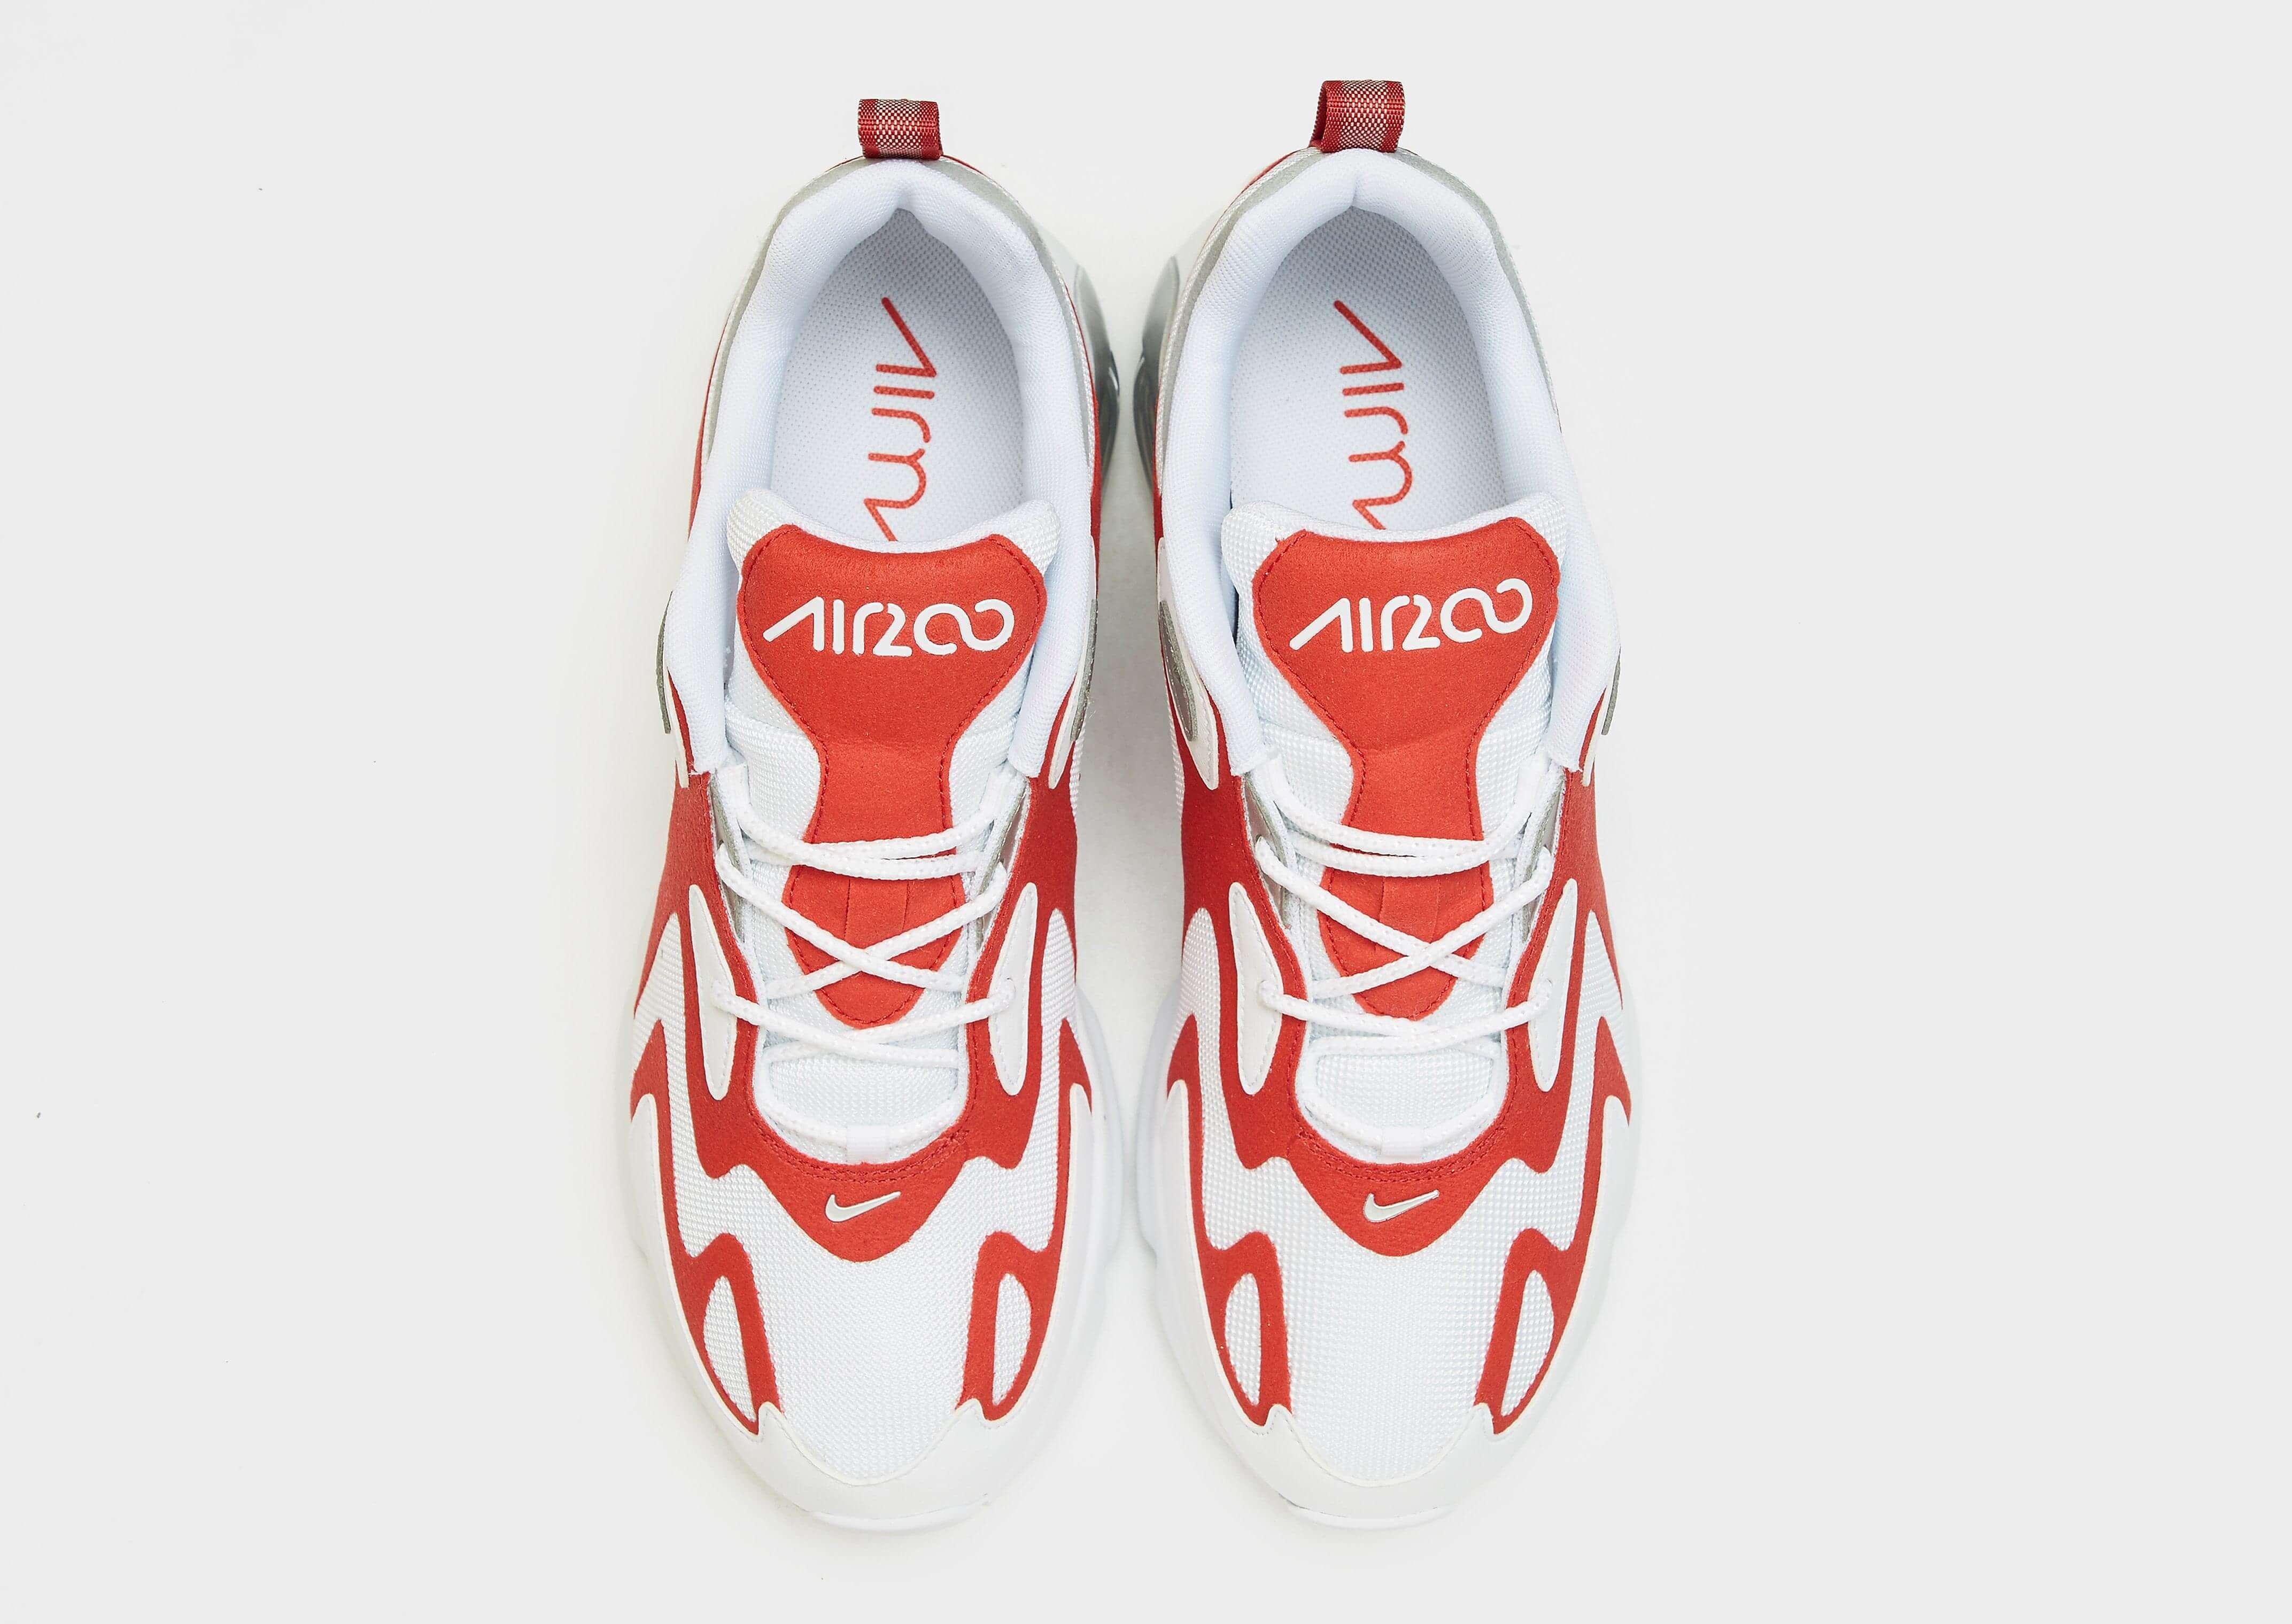 Zapatillas Nike Air Max 97 UL 17 Vast G [00070107] €52.32